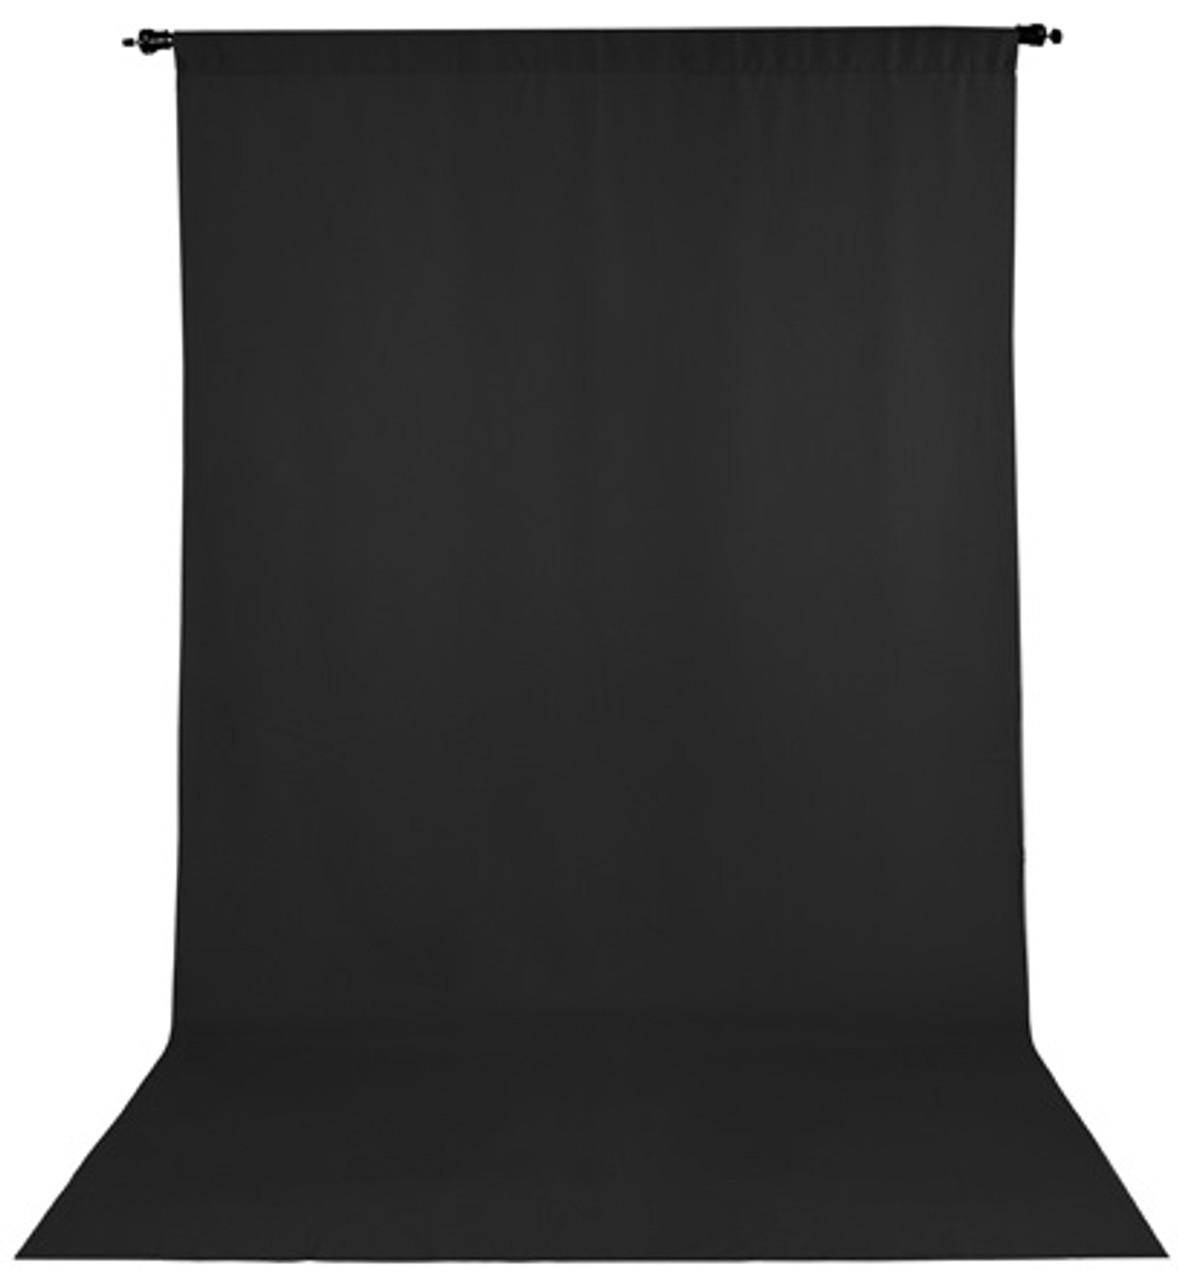 ProMaster Wrinkle Resistant Backdrop 10'x20' - Black #2974